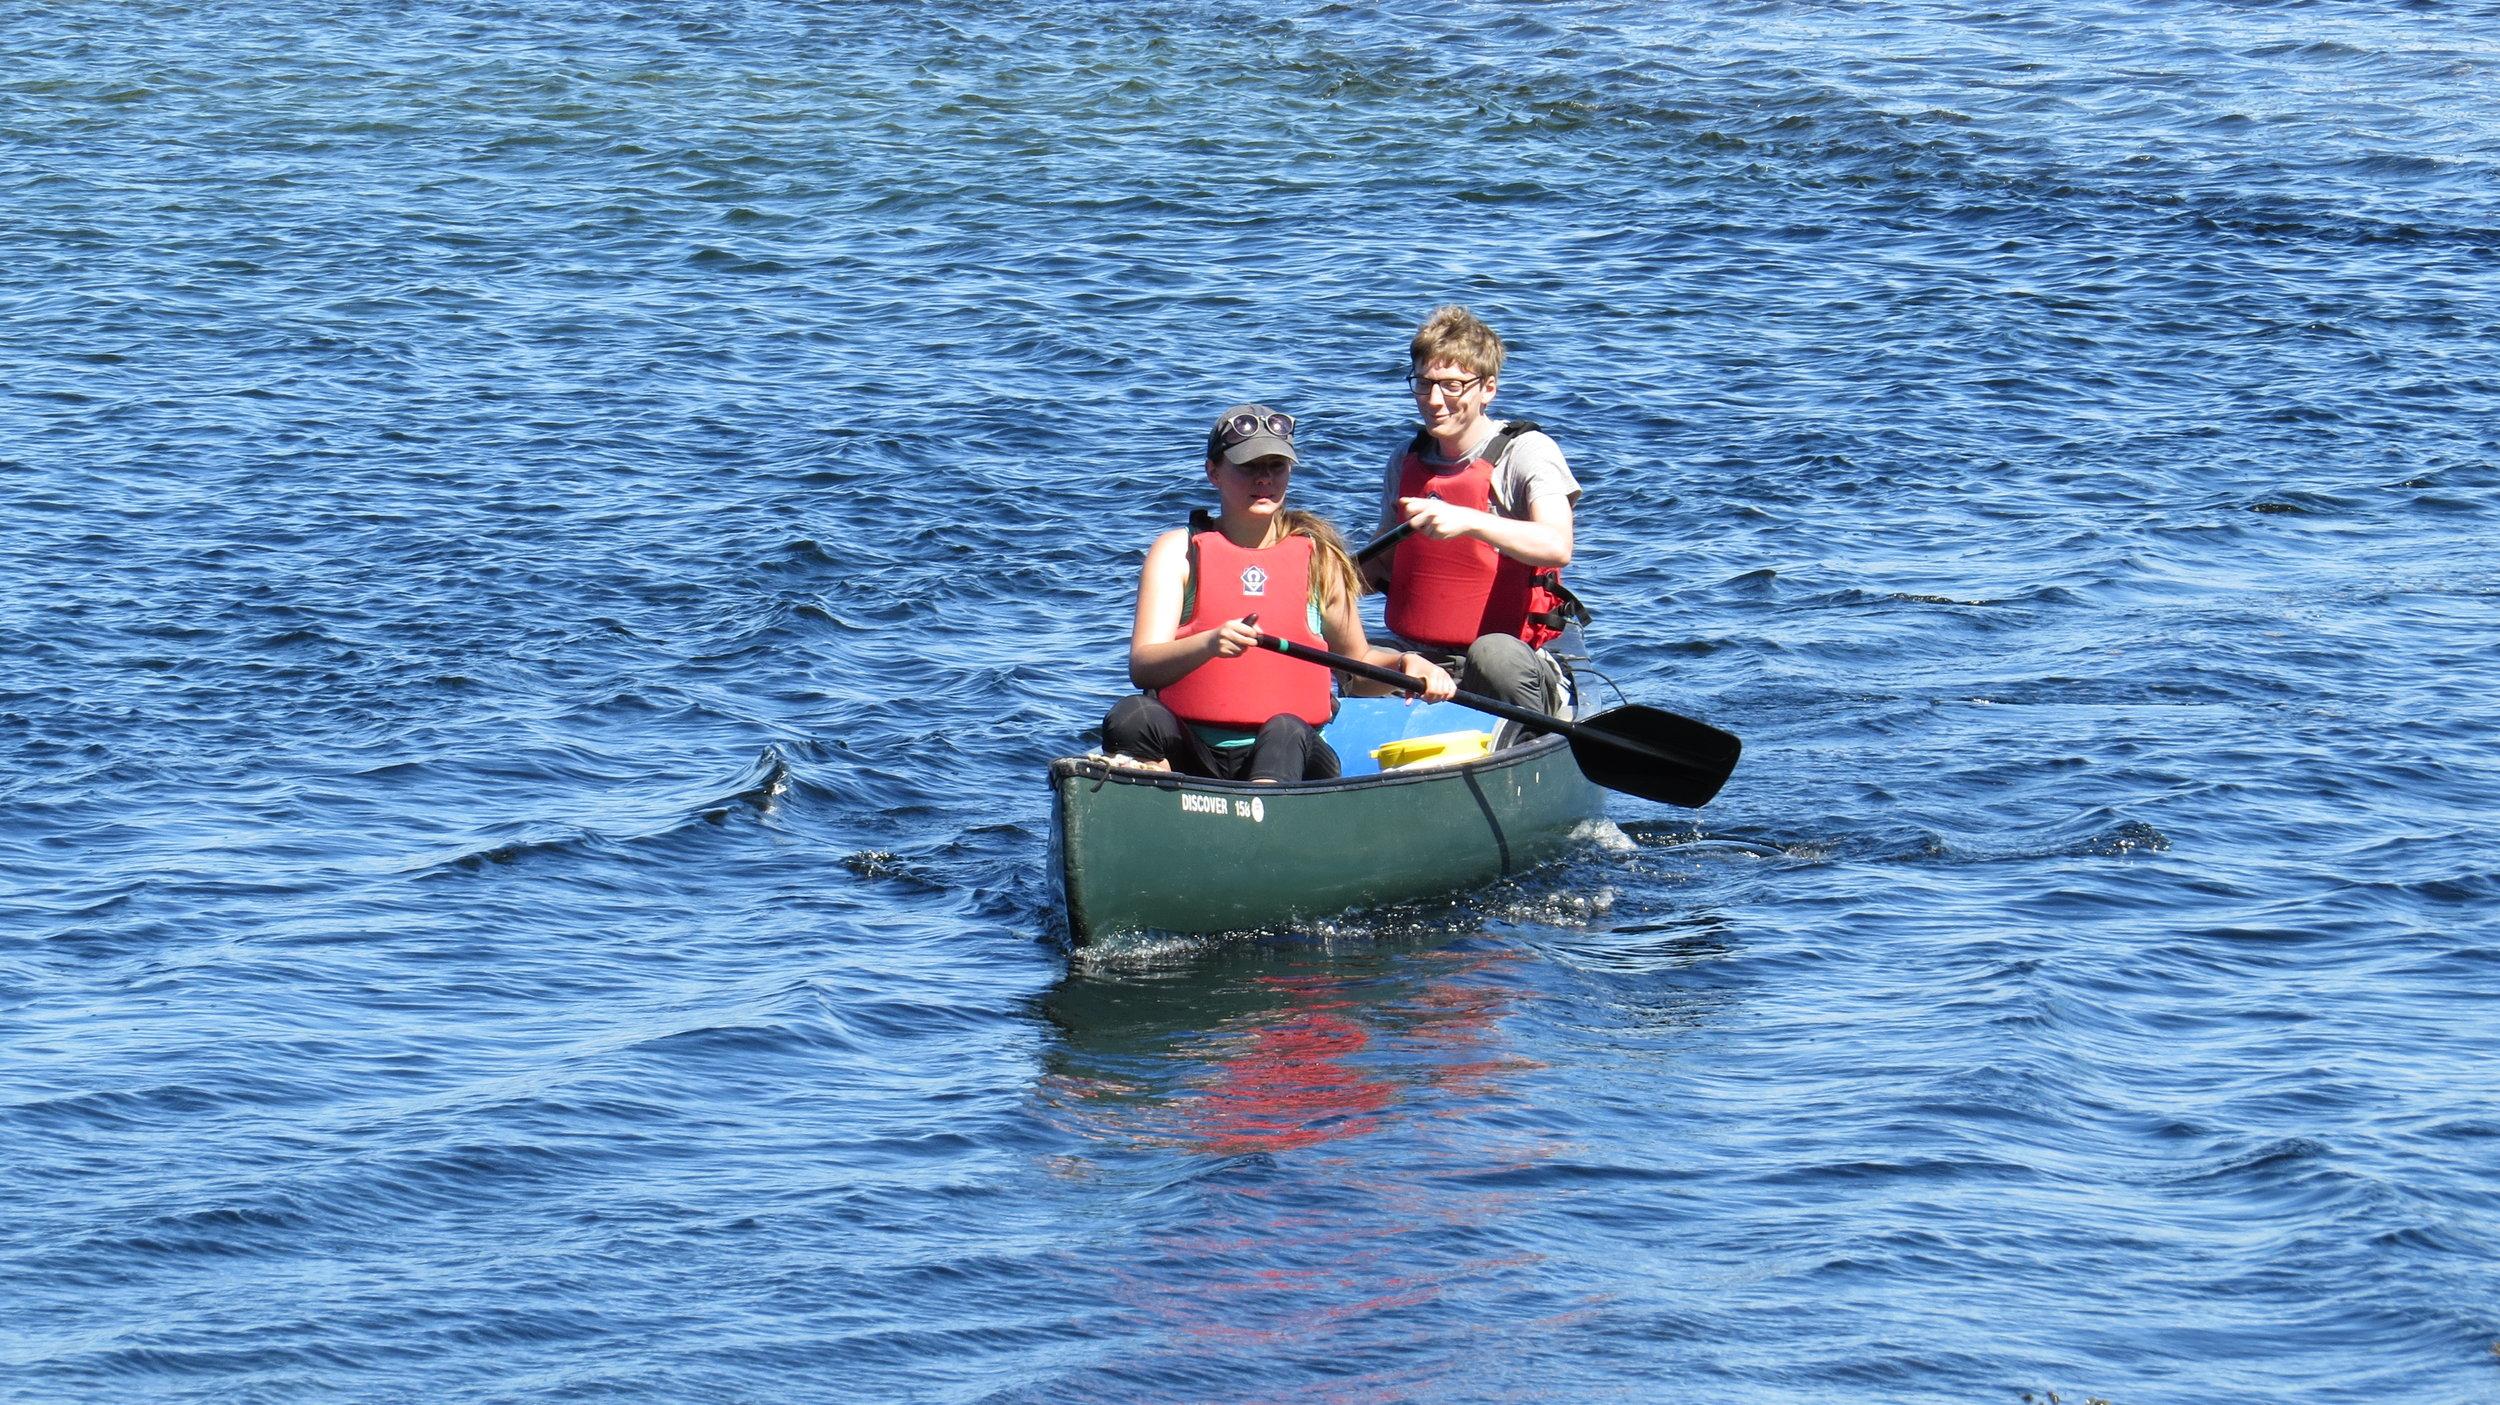 The Kayaking Couple